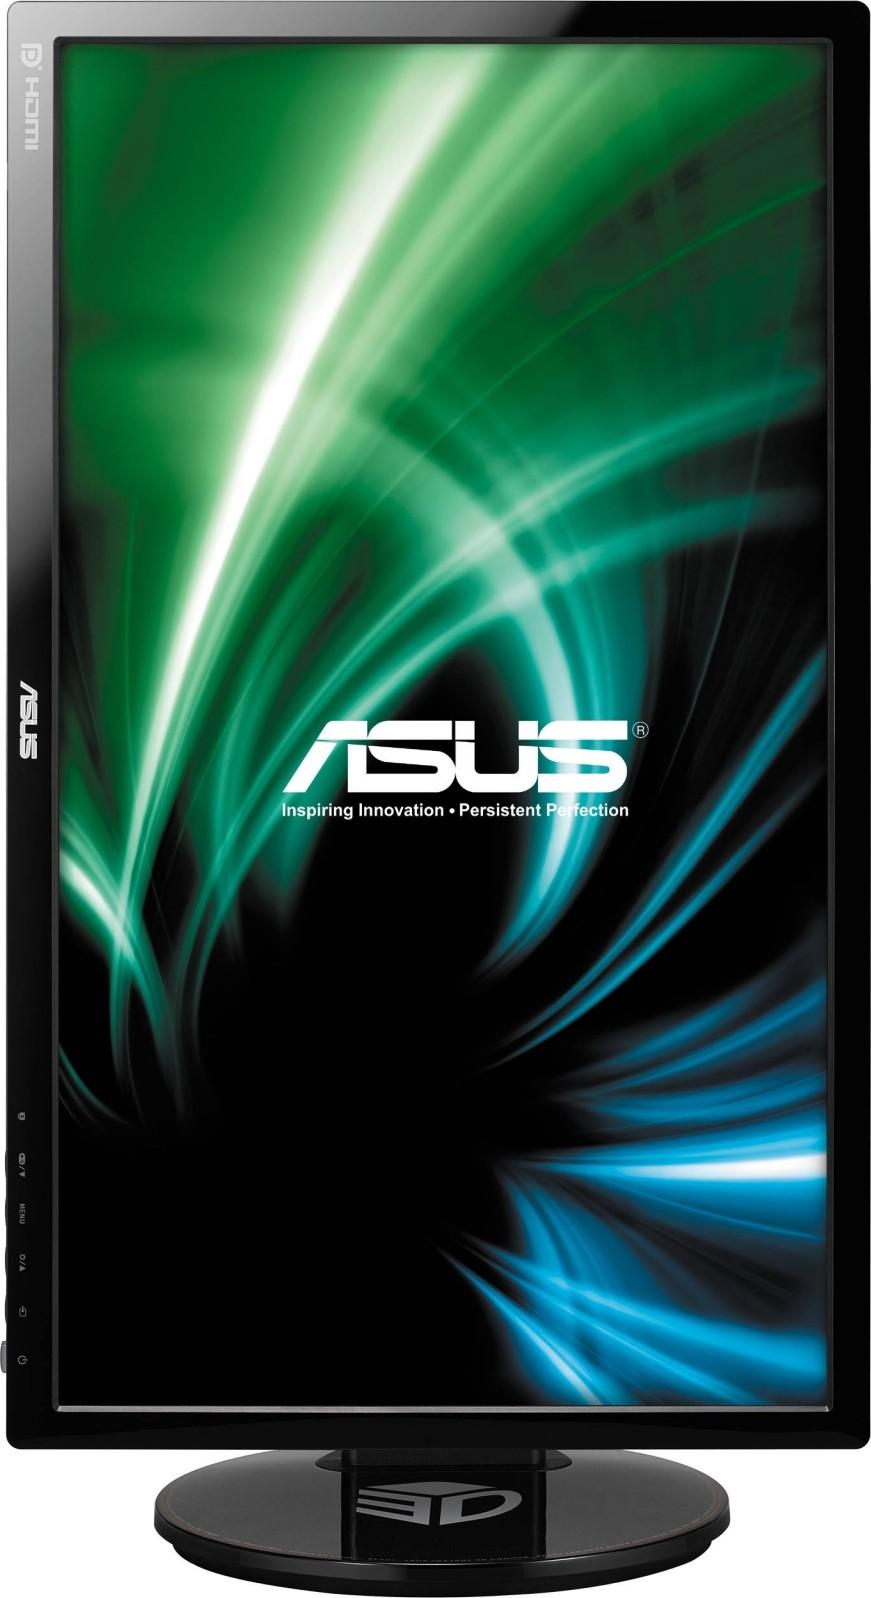 Asus VG248QE 24 Inch 144hz LED Ultimate Fast Gaming Monitor 90LMGG001Q022B1C